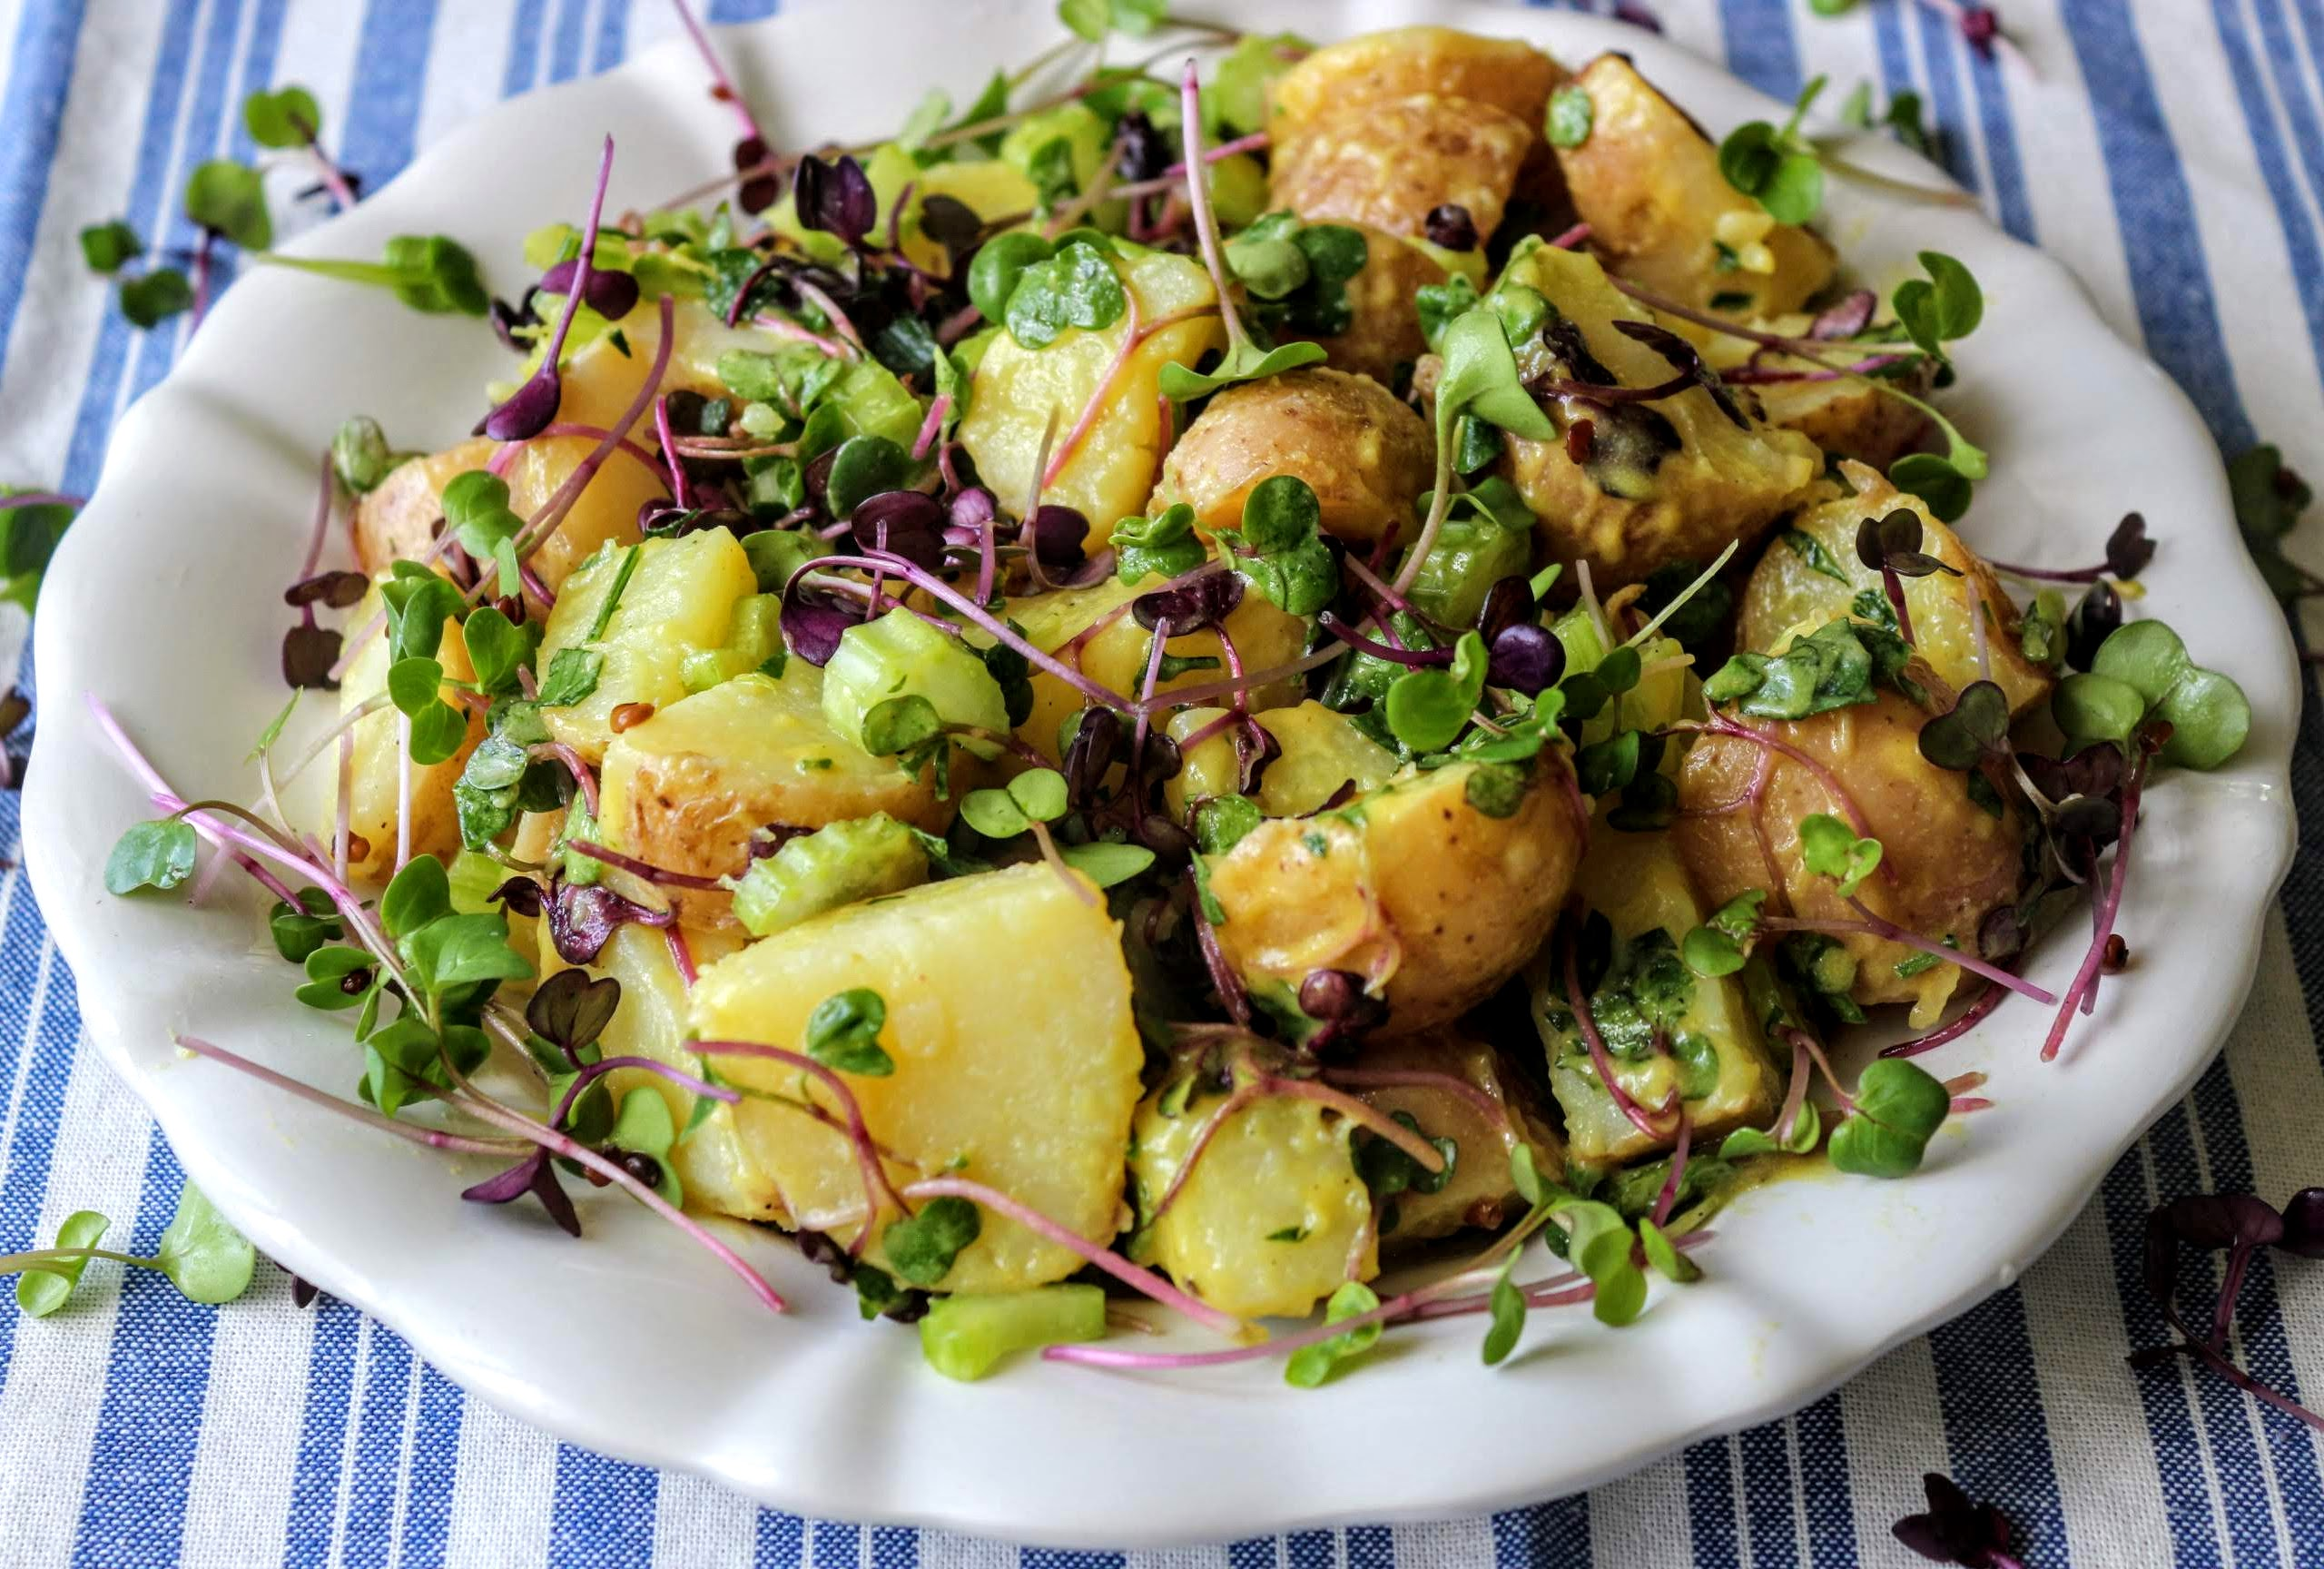 Burgonya saláta retekkel mustáros öntettel